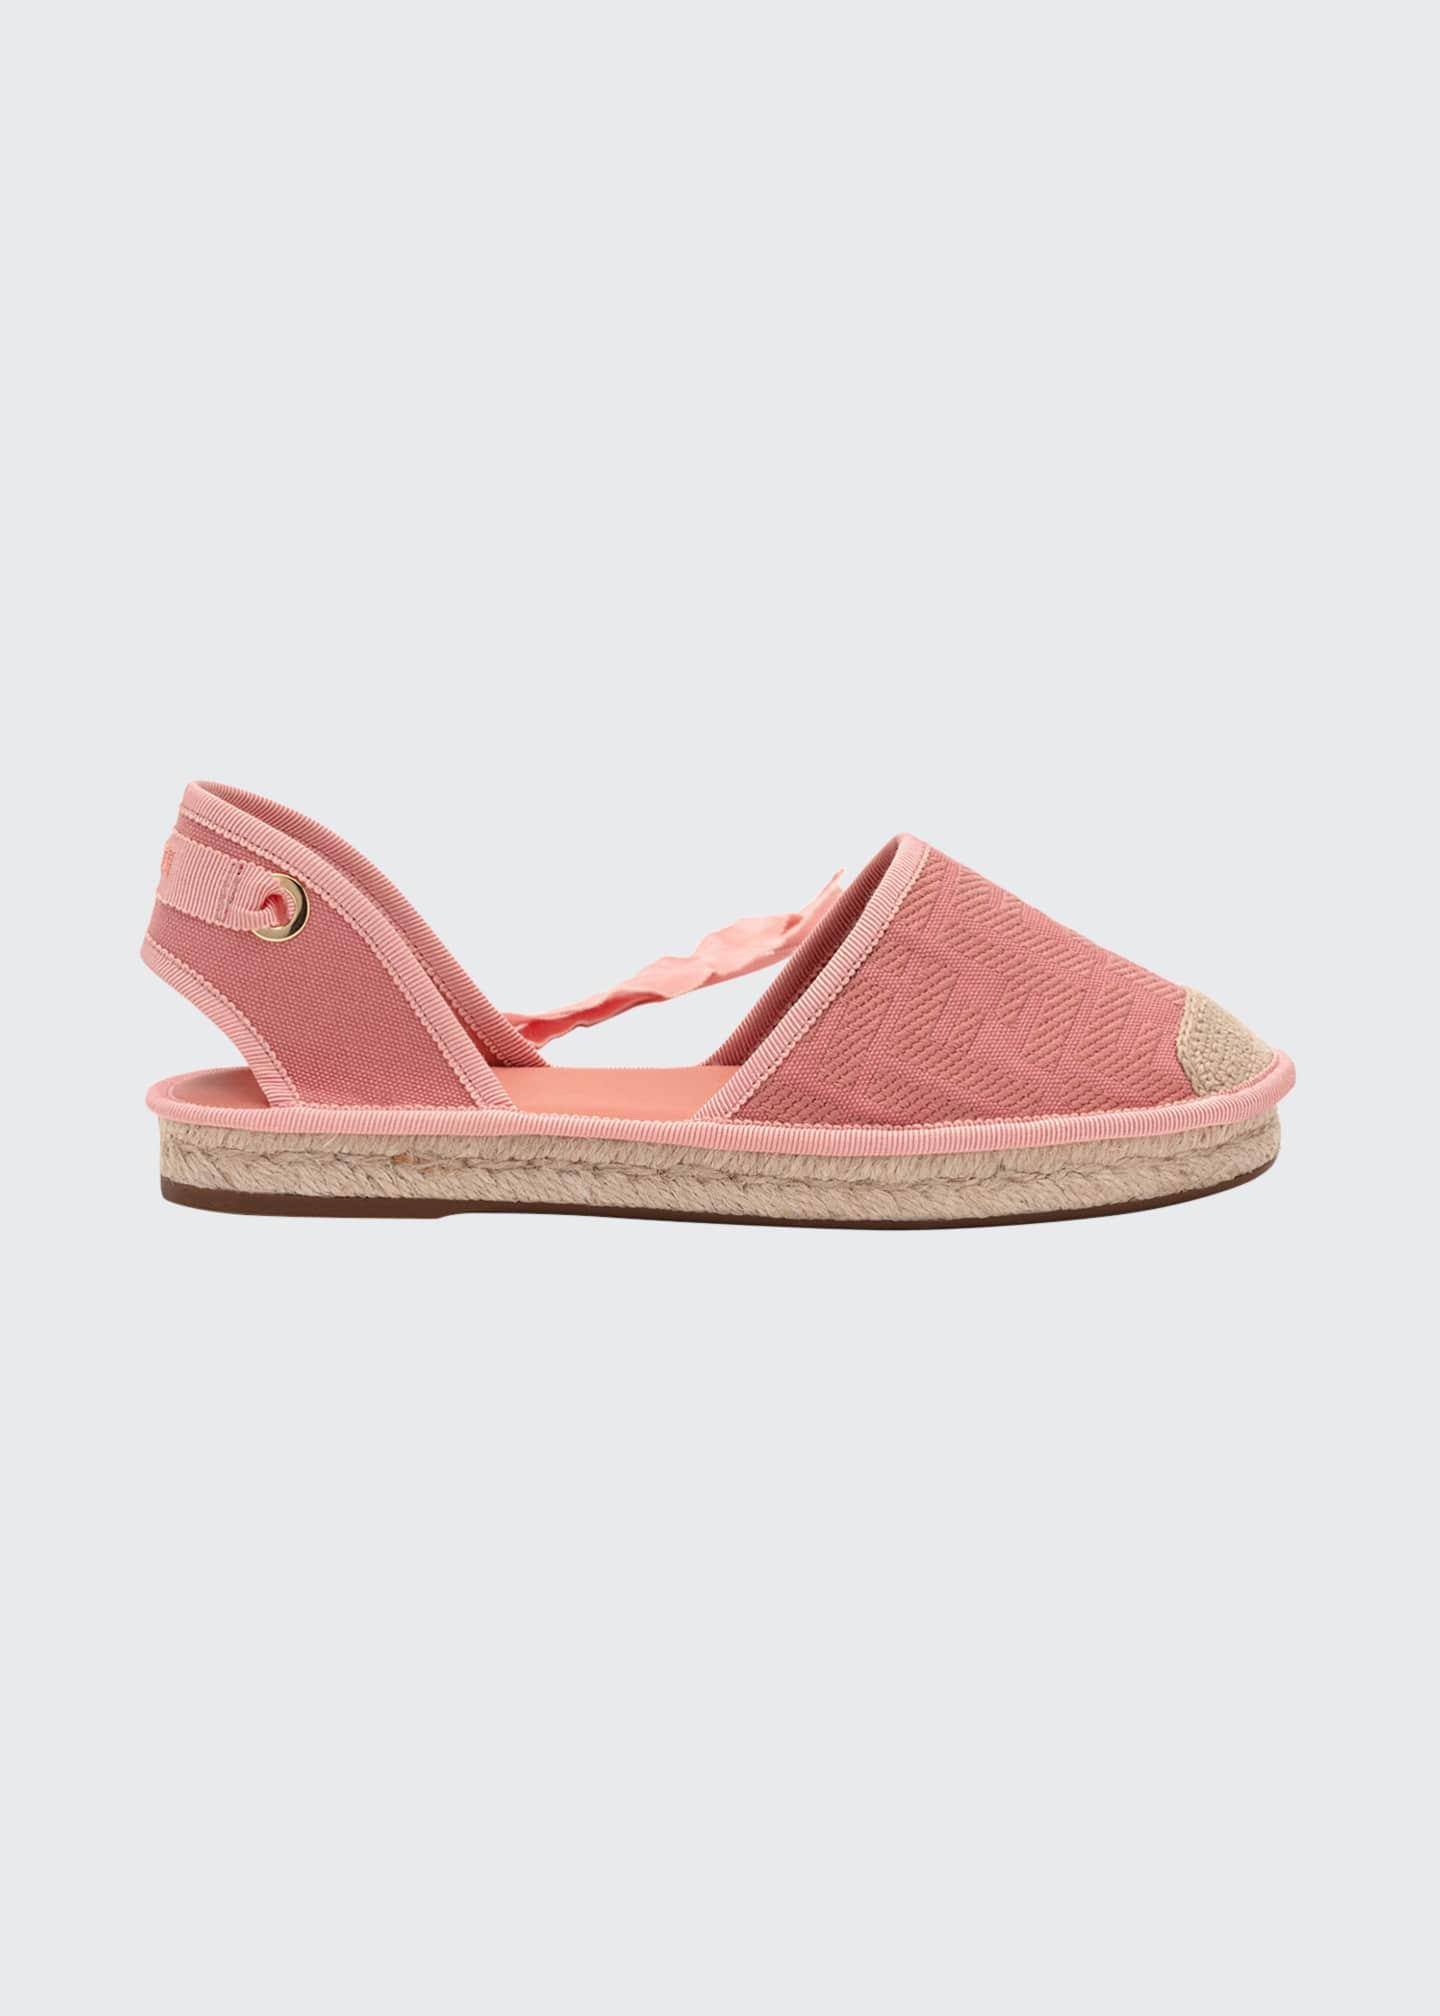 Fendi Roam Ankle-Tie Flat Espadrilles